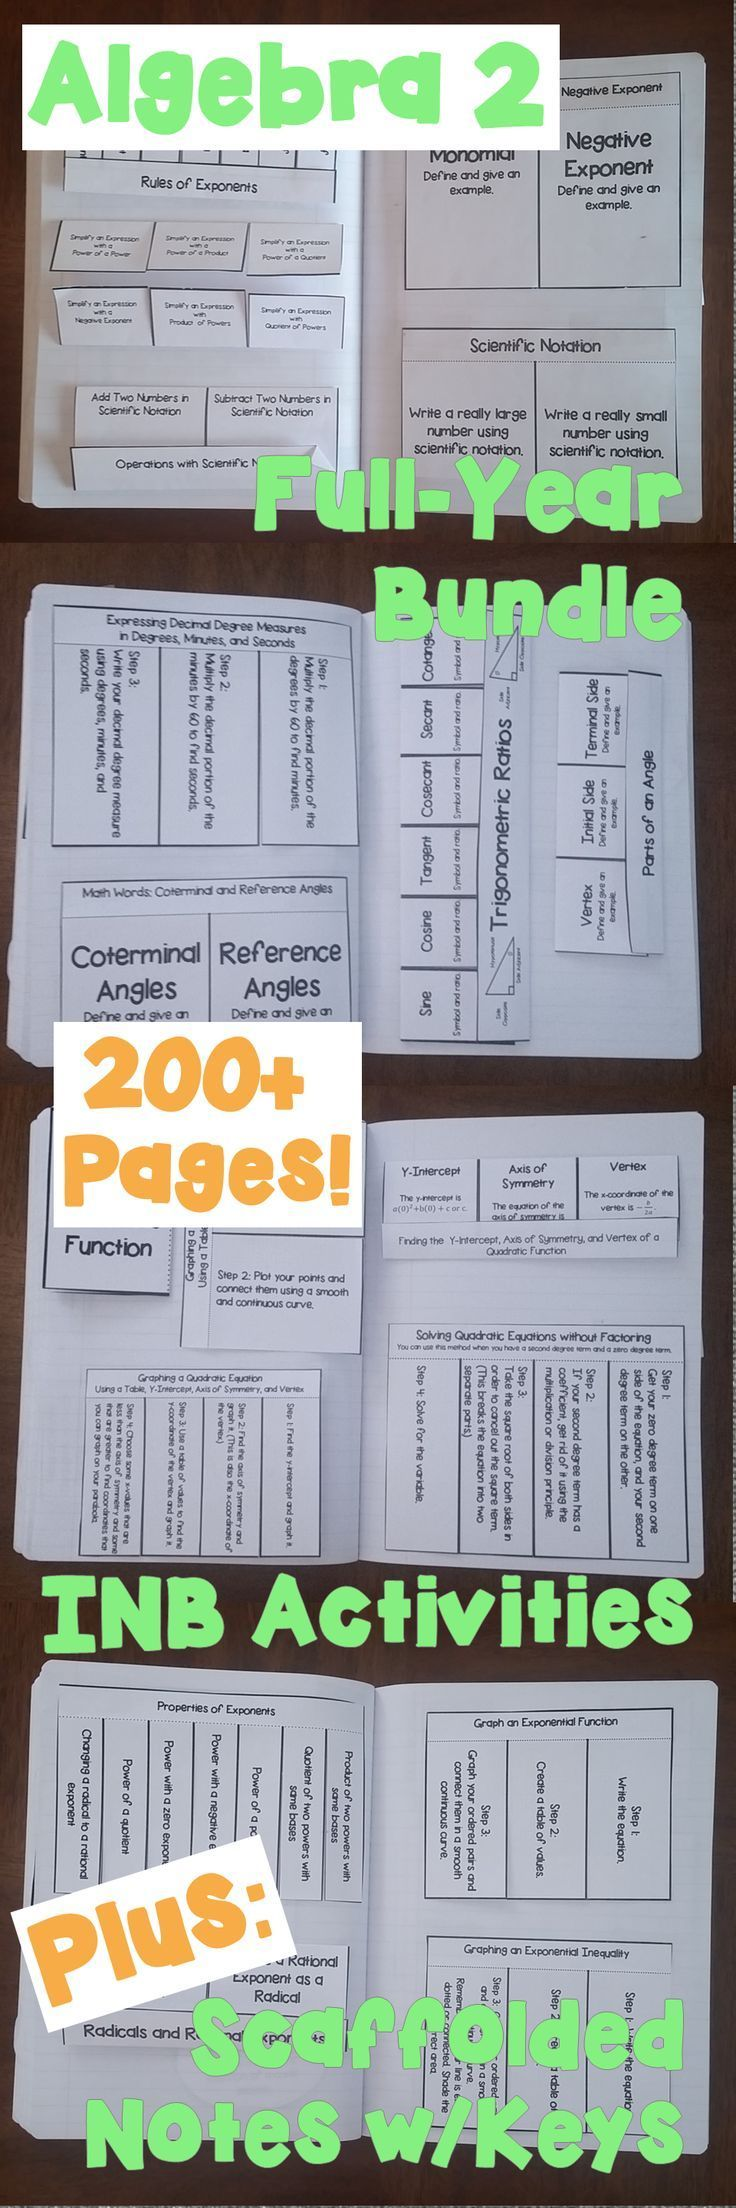 Algebra 2 Interactive Notebook Activities and Scaffolded